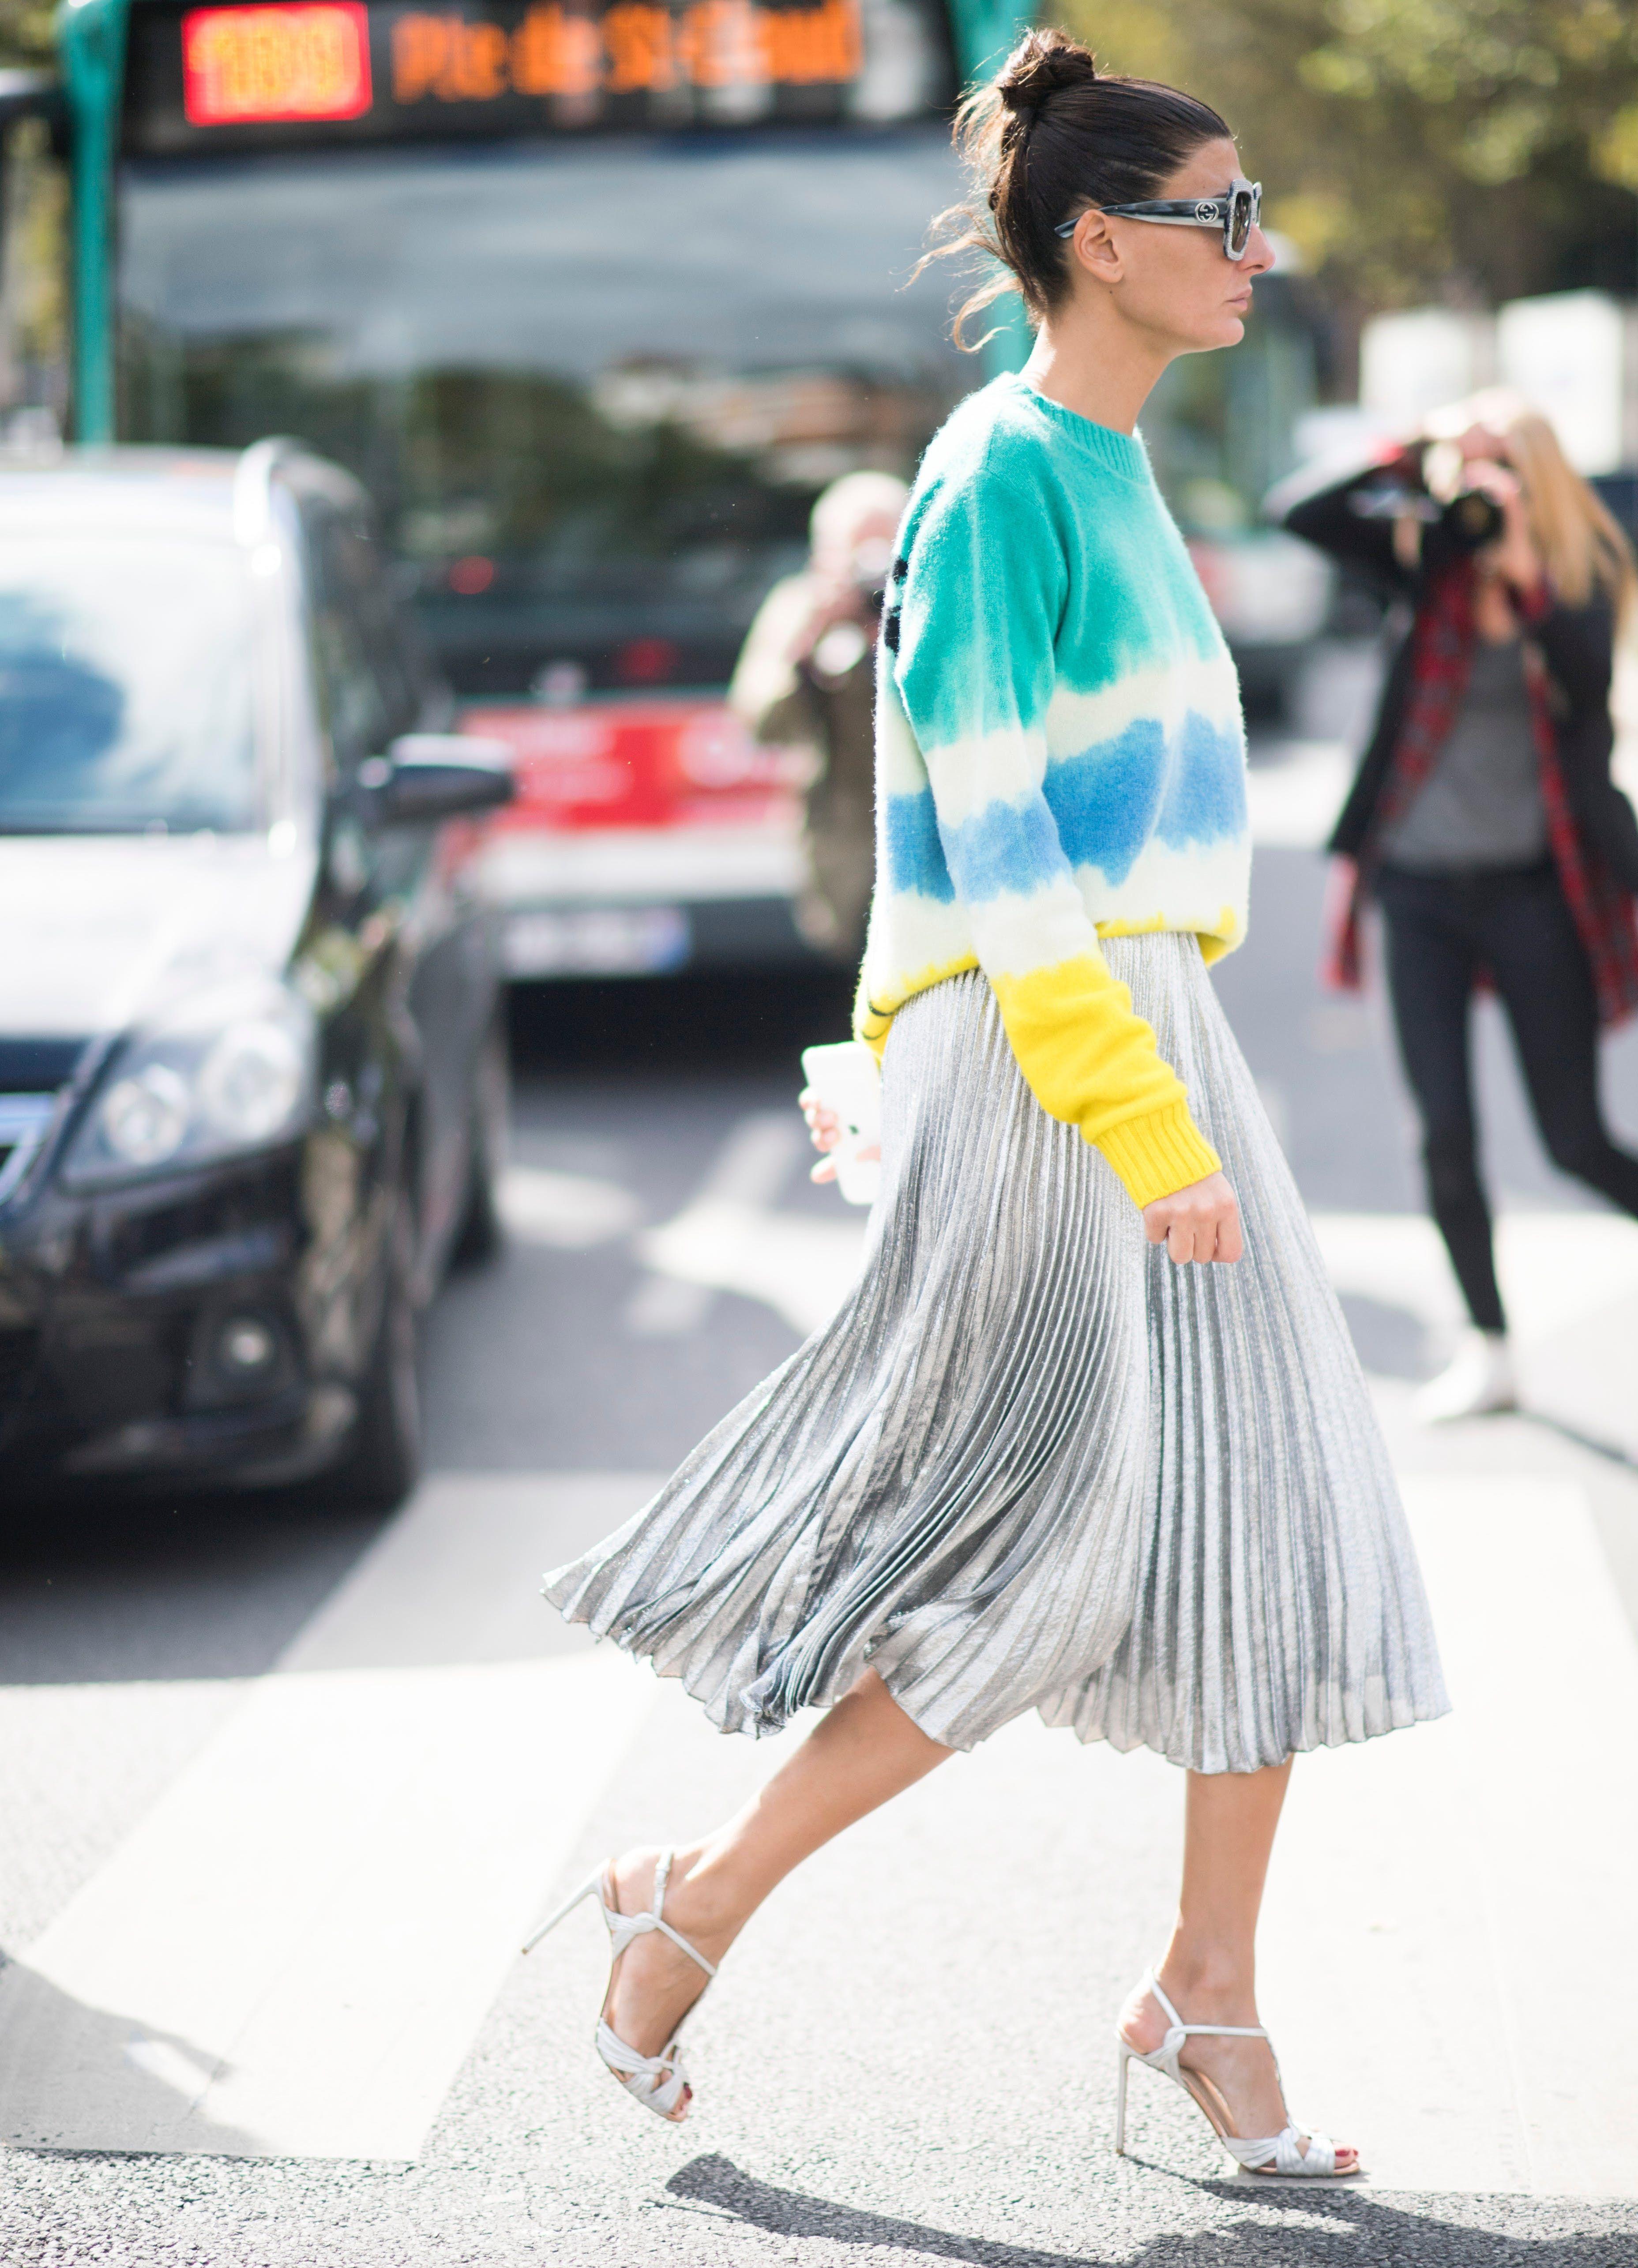 Fashion Trendsfall trend sweatshirts catalog photo